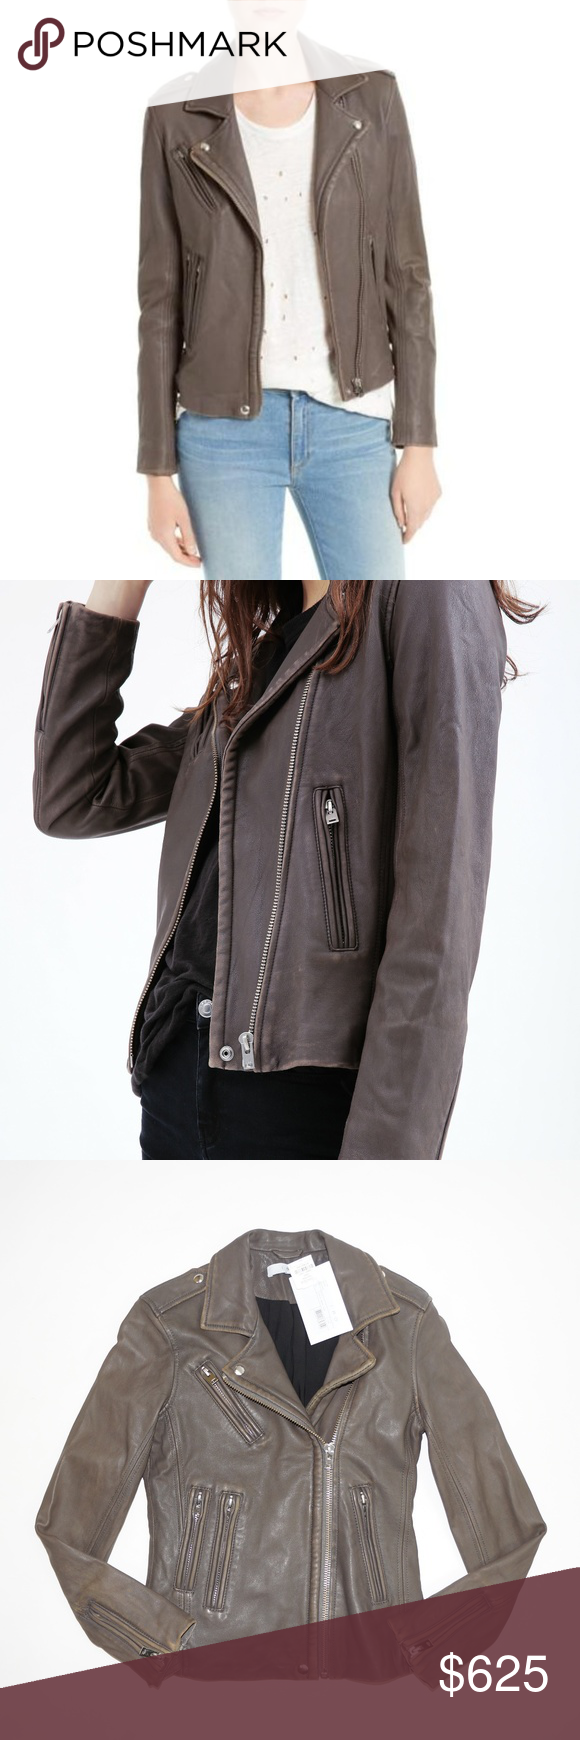 Iro Brown Han Moto Leather Jacket Leather Jacket Leather Moto Jacket Jackets [ 1740 x 580 Pixel ]